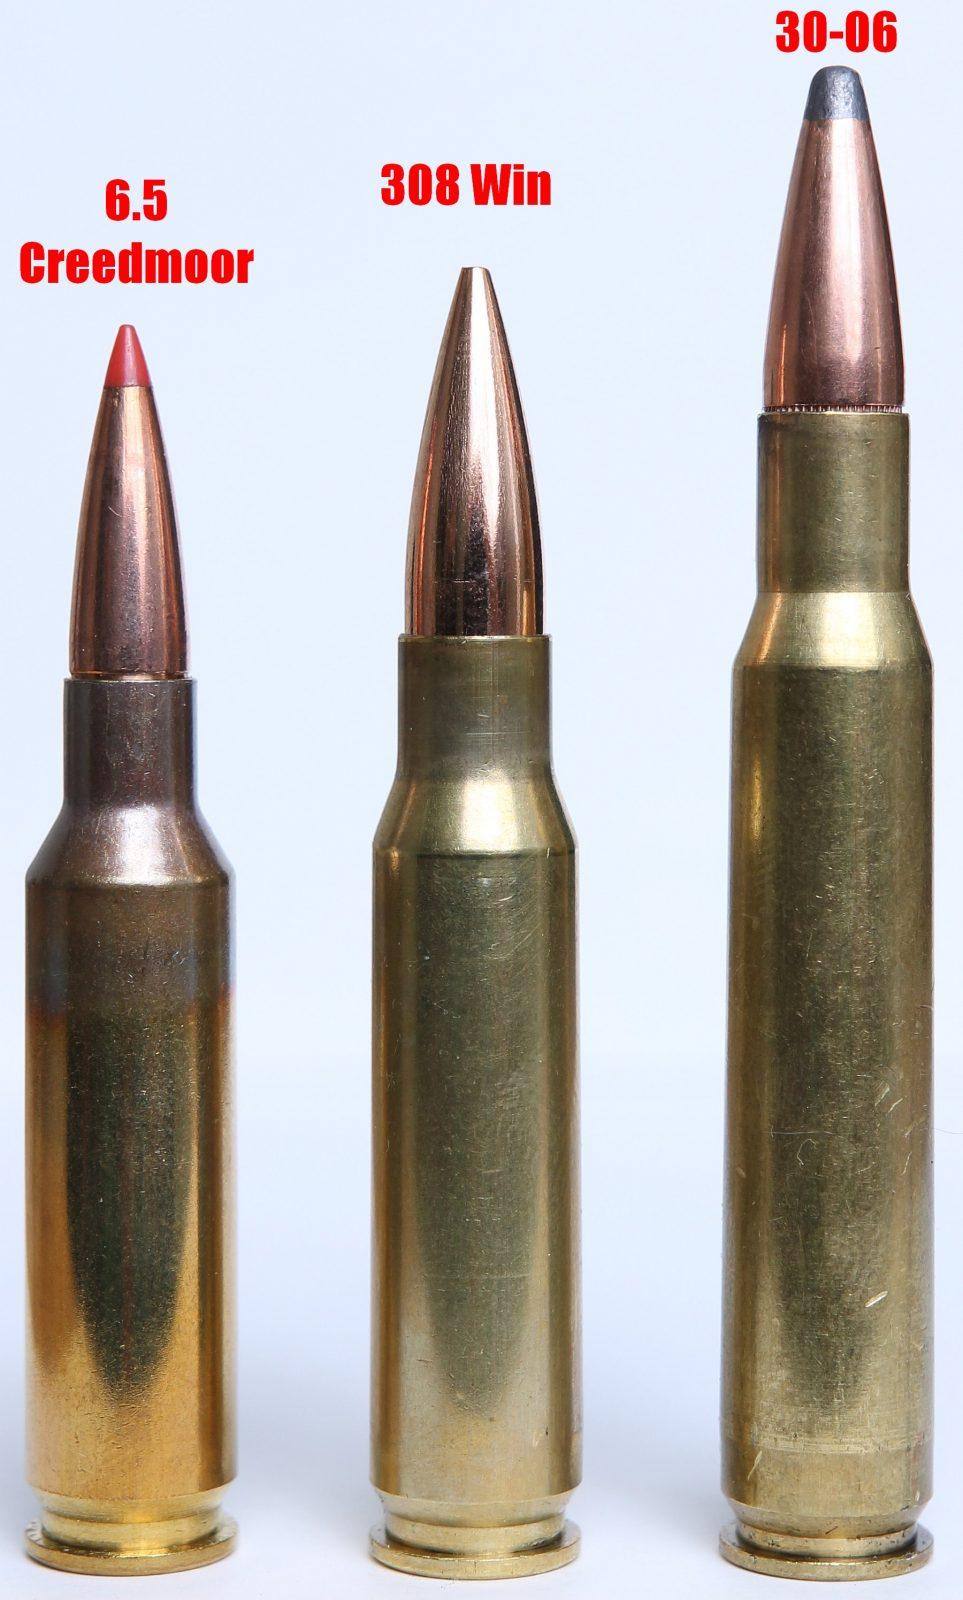 308 caliber will penetrate